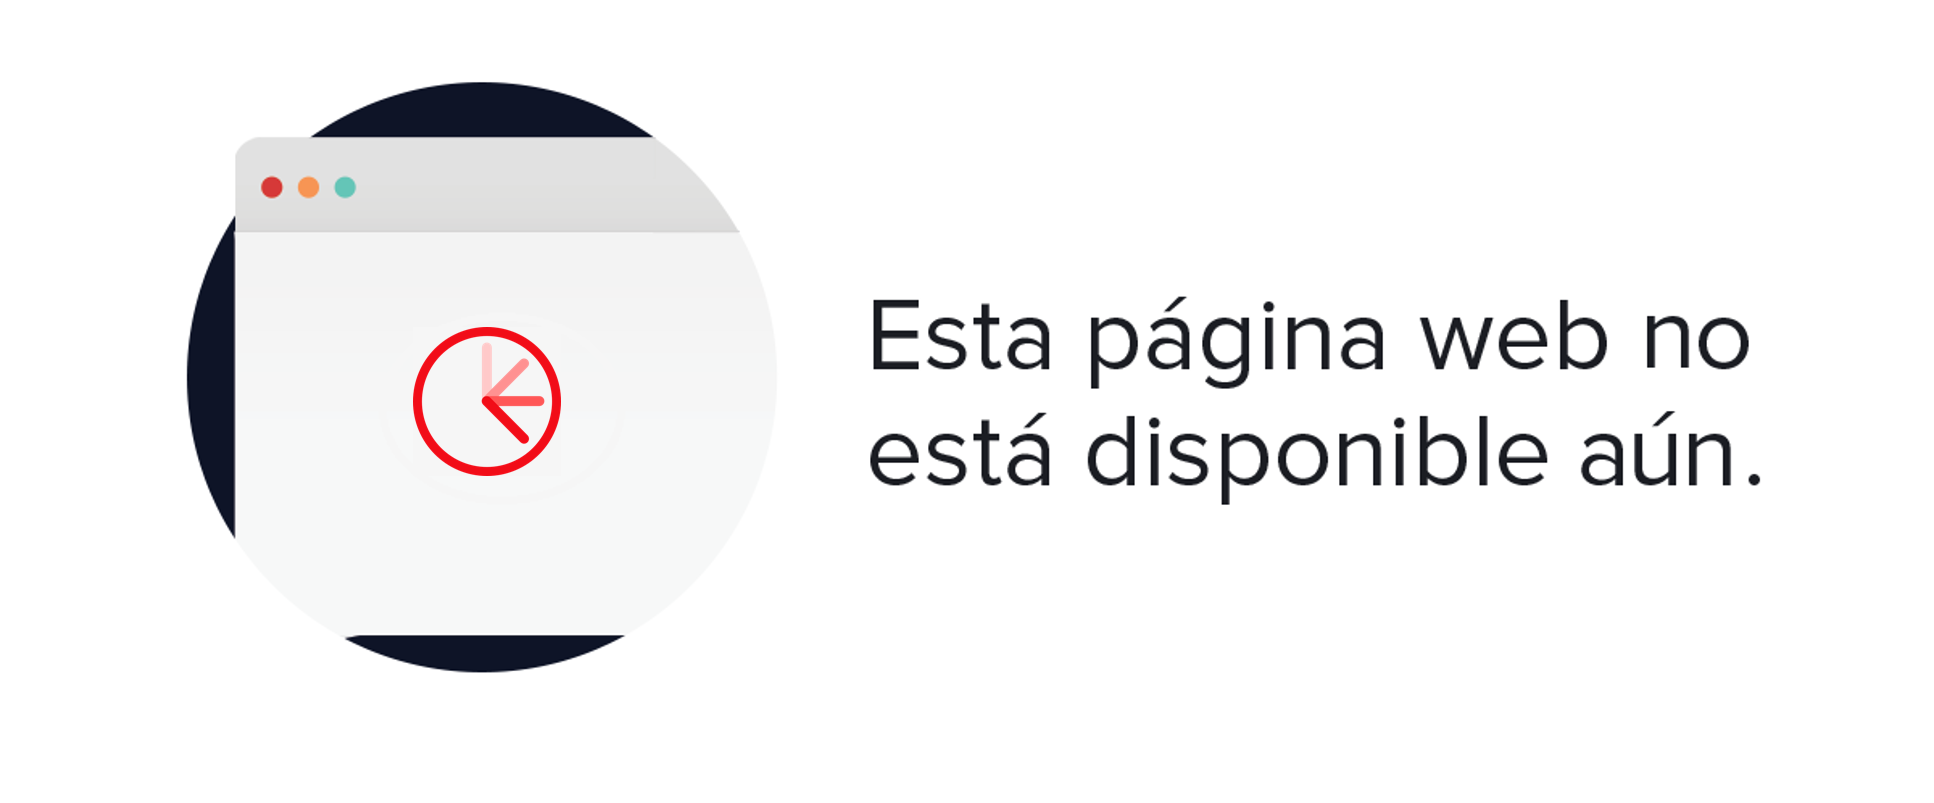 Zapatilla blanca lavada Sayel Away para mujer 10 M (B) iiALFiYEuo